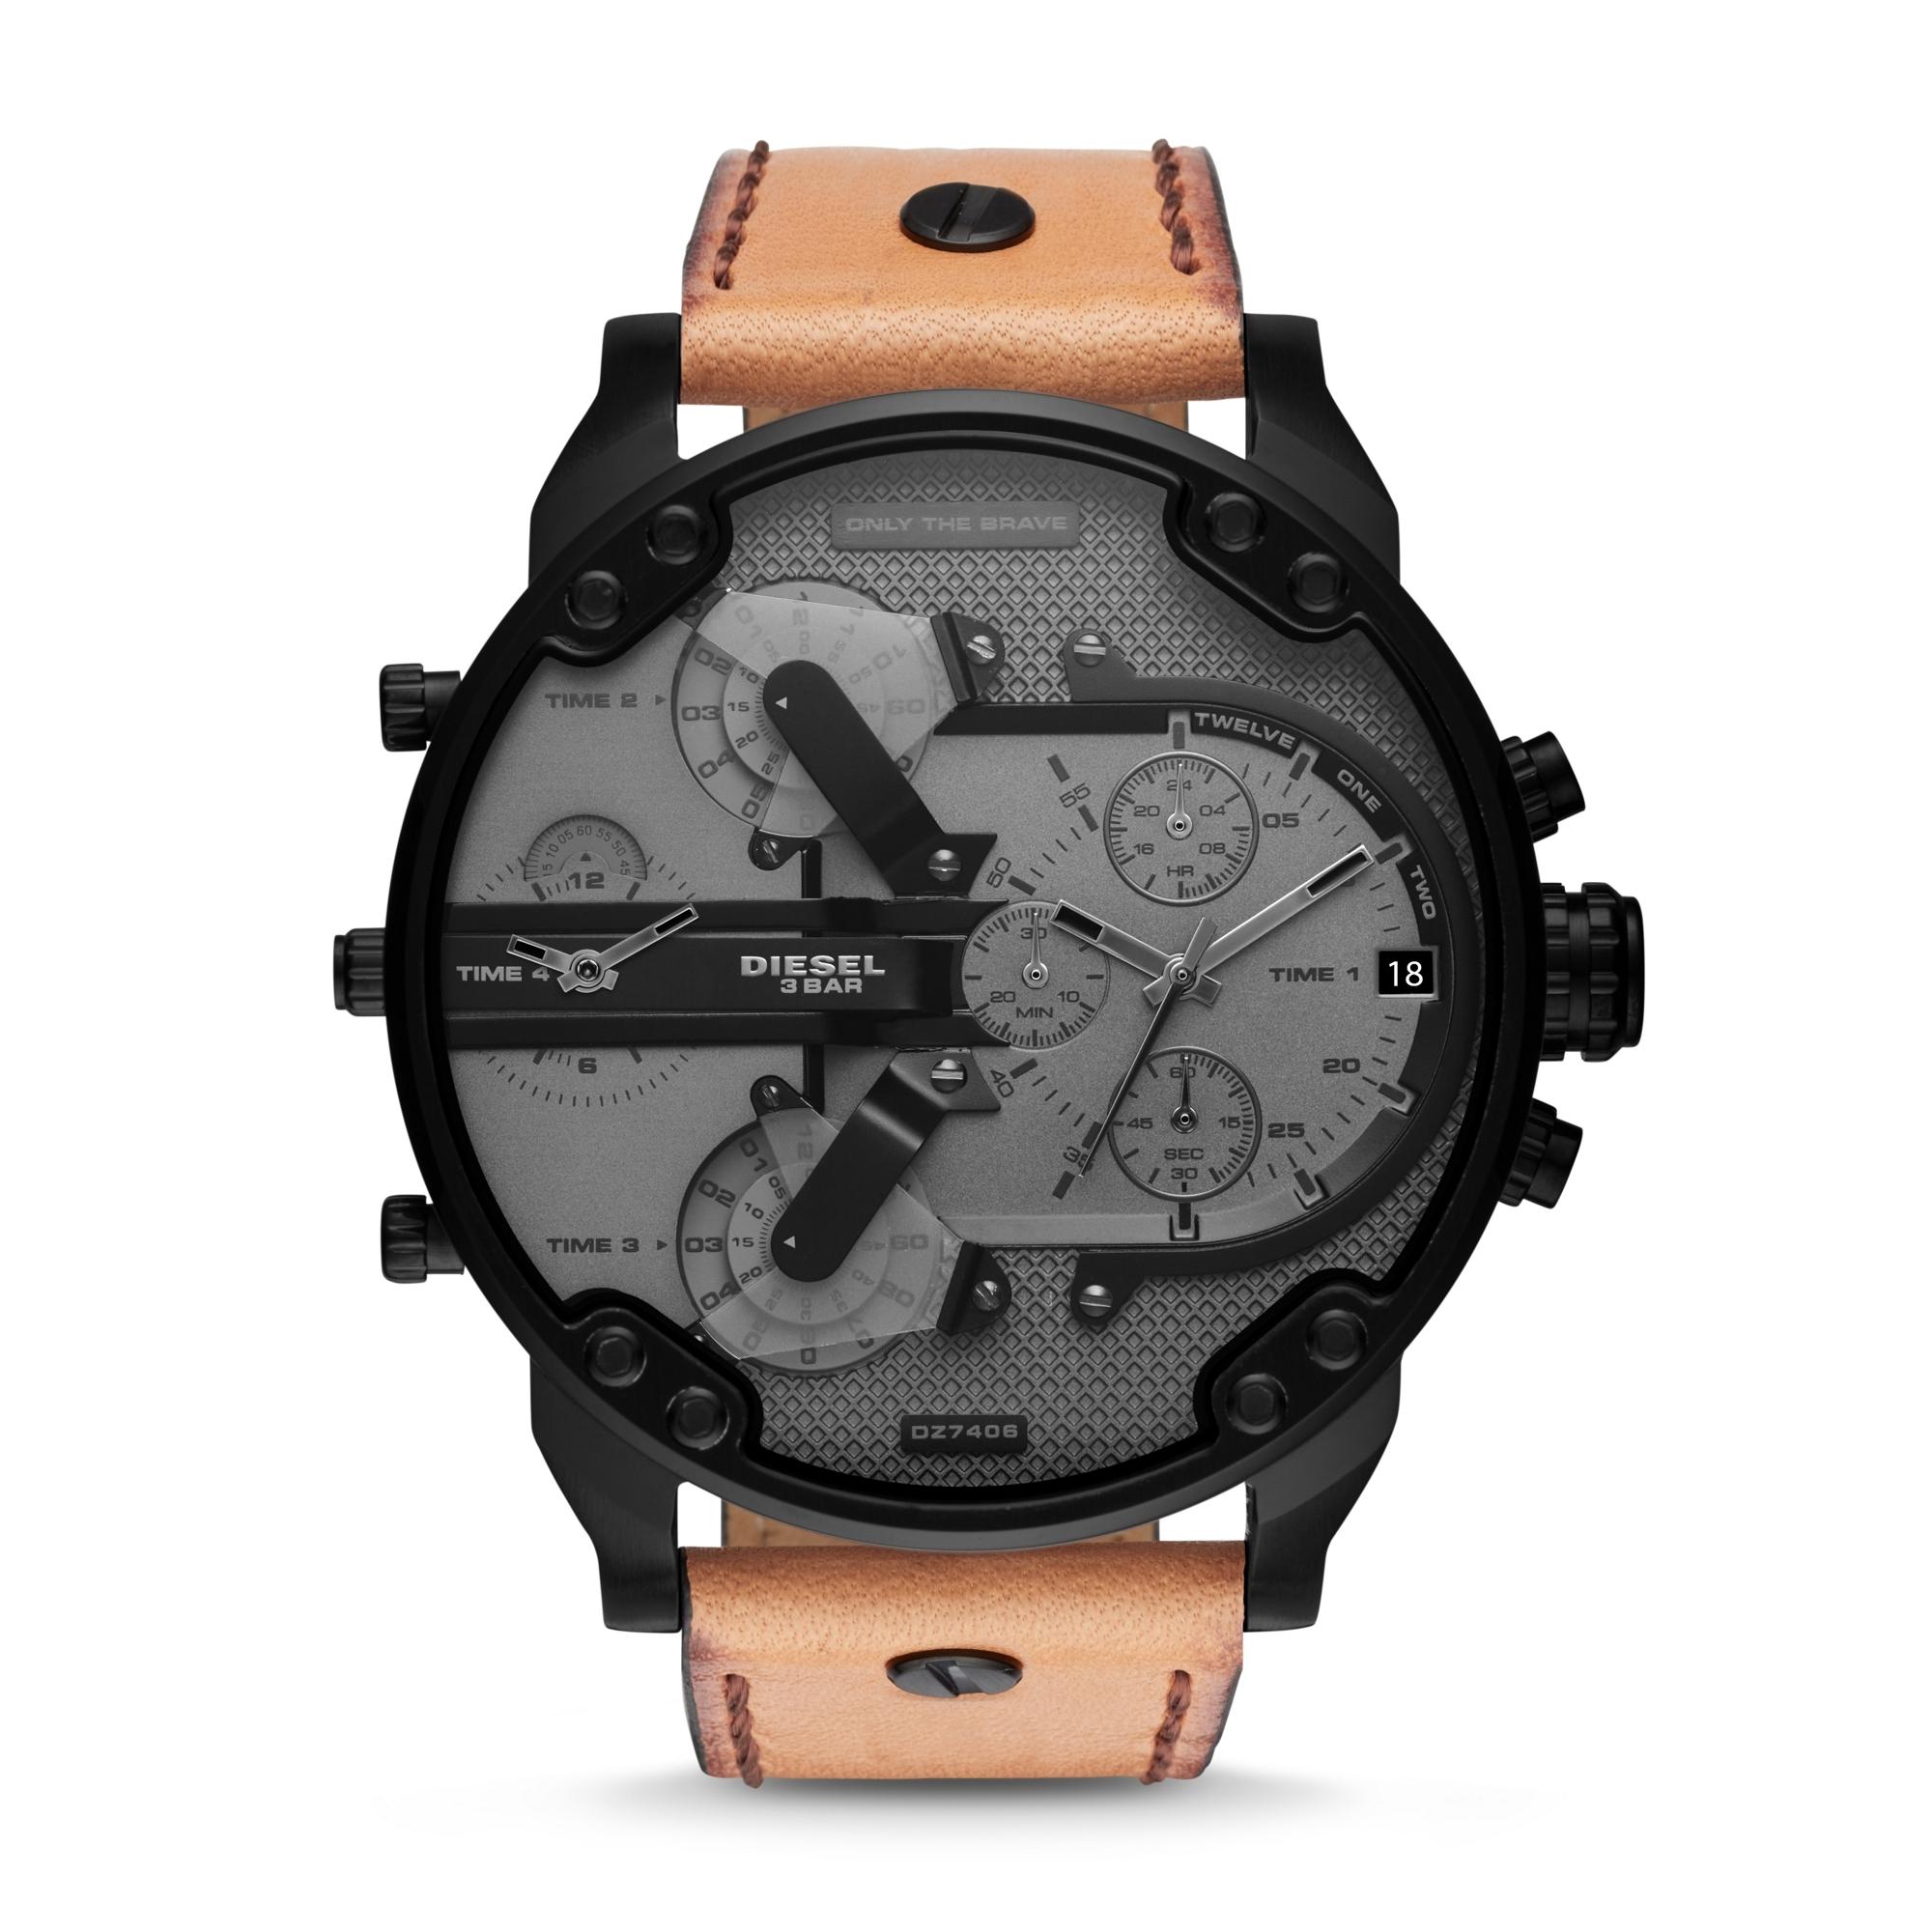 e95a1eb3 Diesel DZ 7406 – купить наручные часы, сравнение цен интернет ...